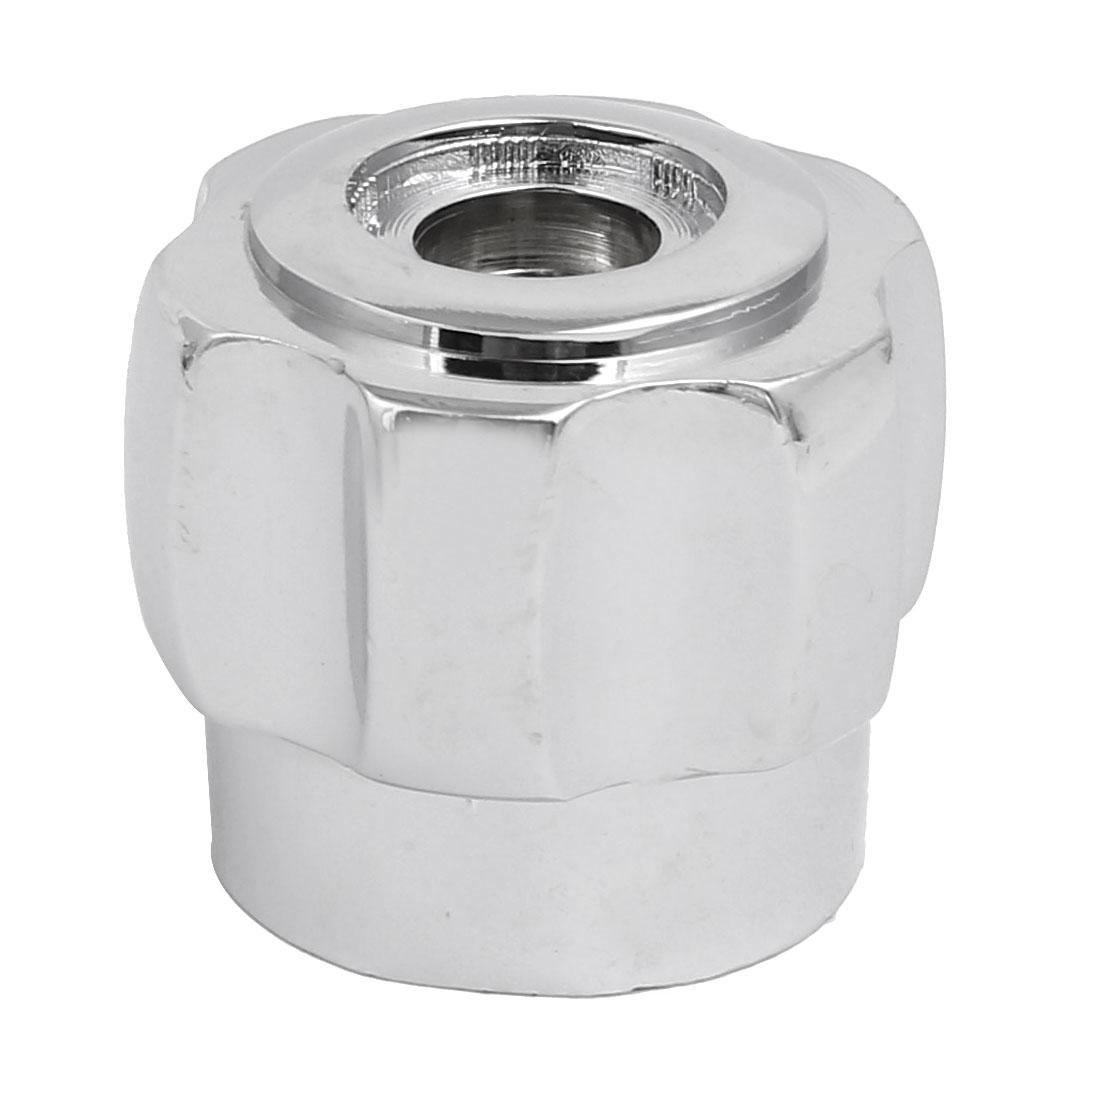 35mmx30mm Zinc Alloy Faucet Water Tap Handle Grip Knob Silver Tone